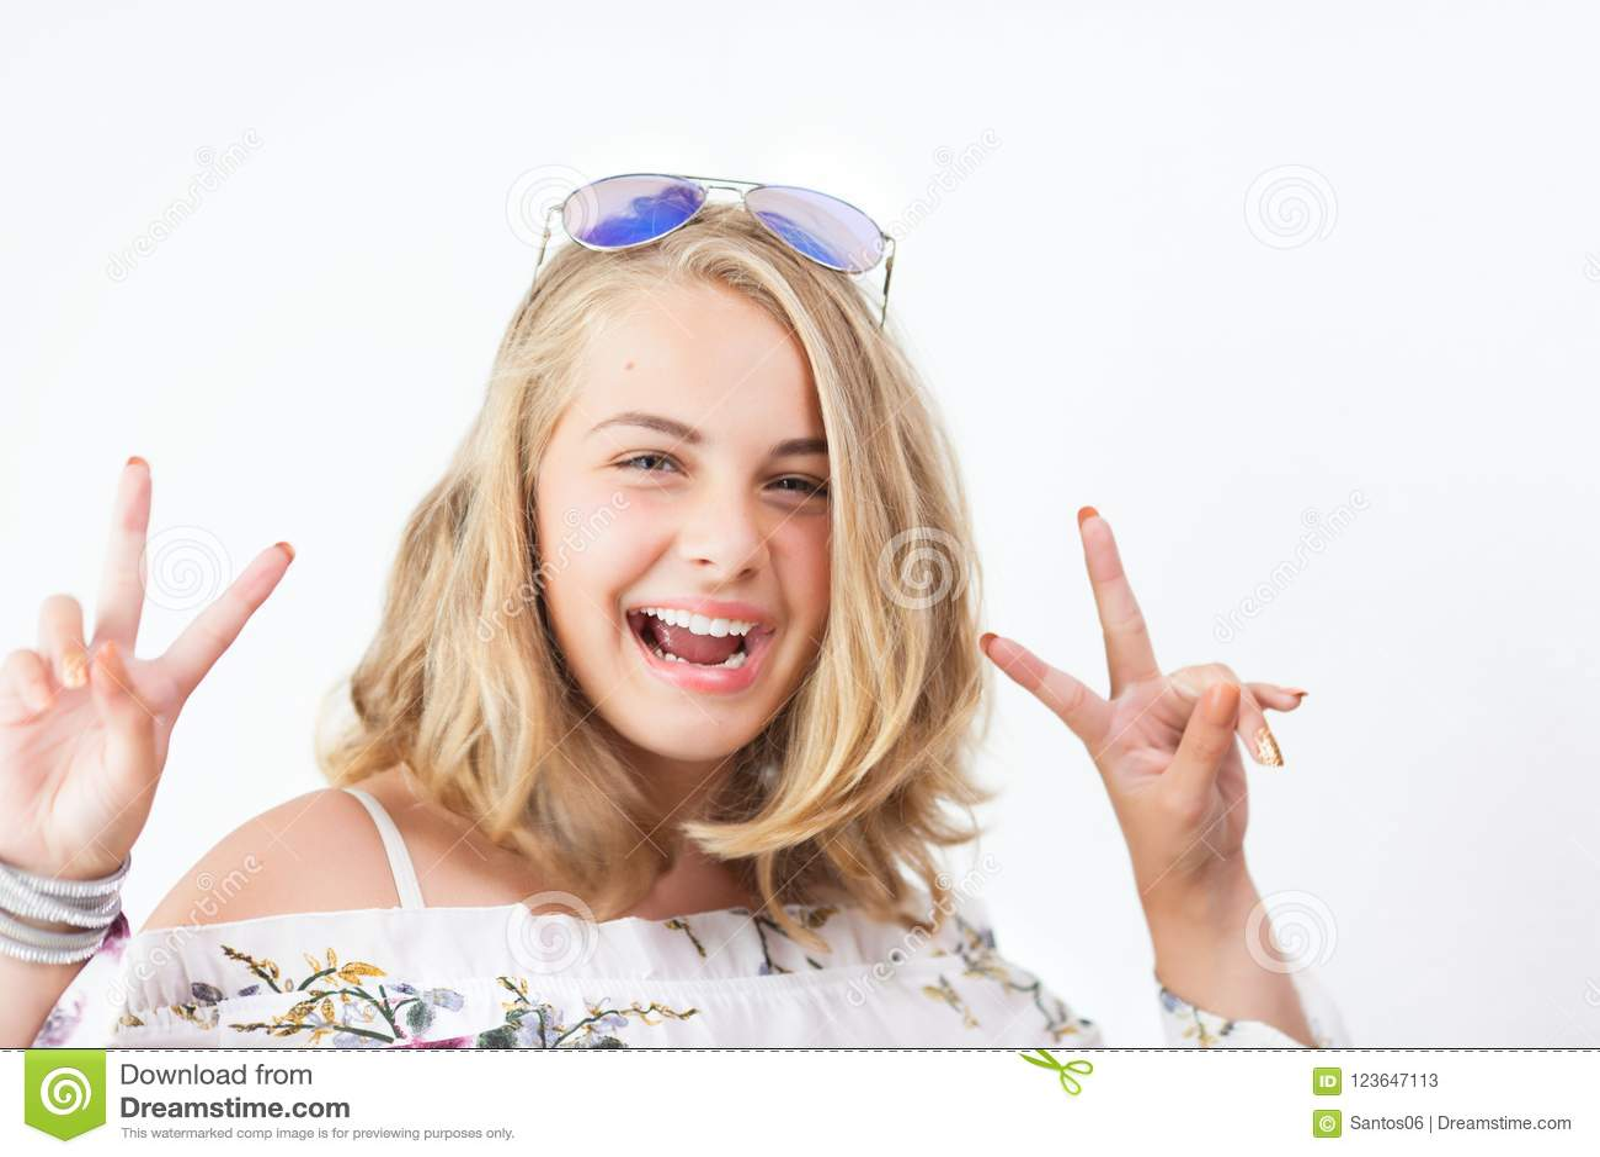 Teenage girl with glasses